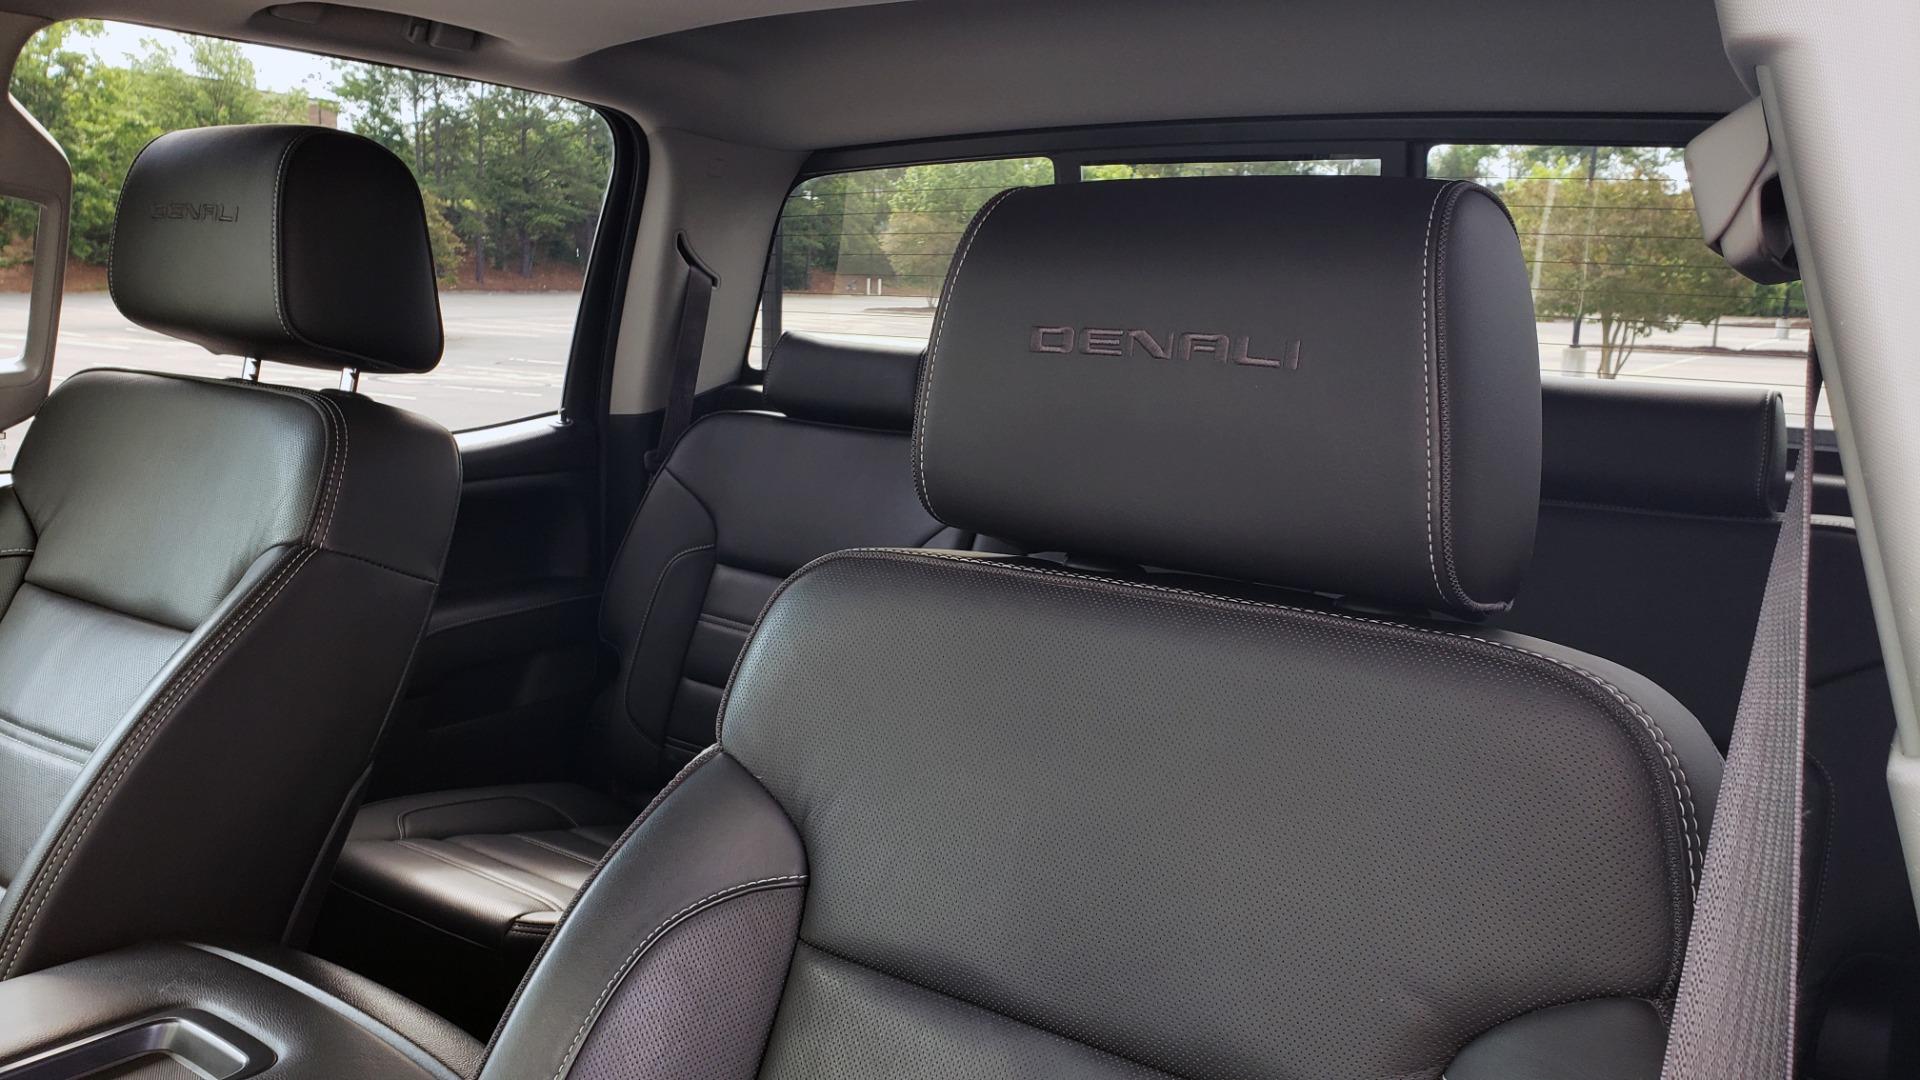 Used 2015 GMC SIERRA 2500HD DENALI / WIFI / NAV / DURAMAX PLUS / DRVR ALERT / SUNROOF / REARVIEW for sale $56,995 at Formula Imports in Charlotte NC 28227 32